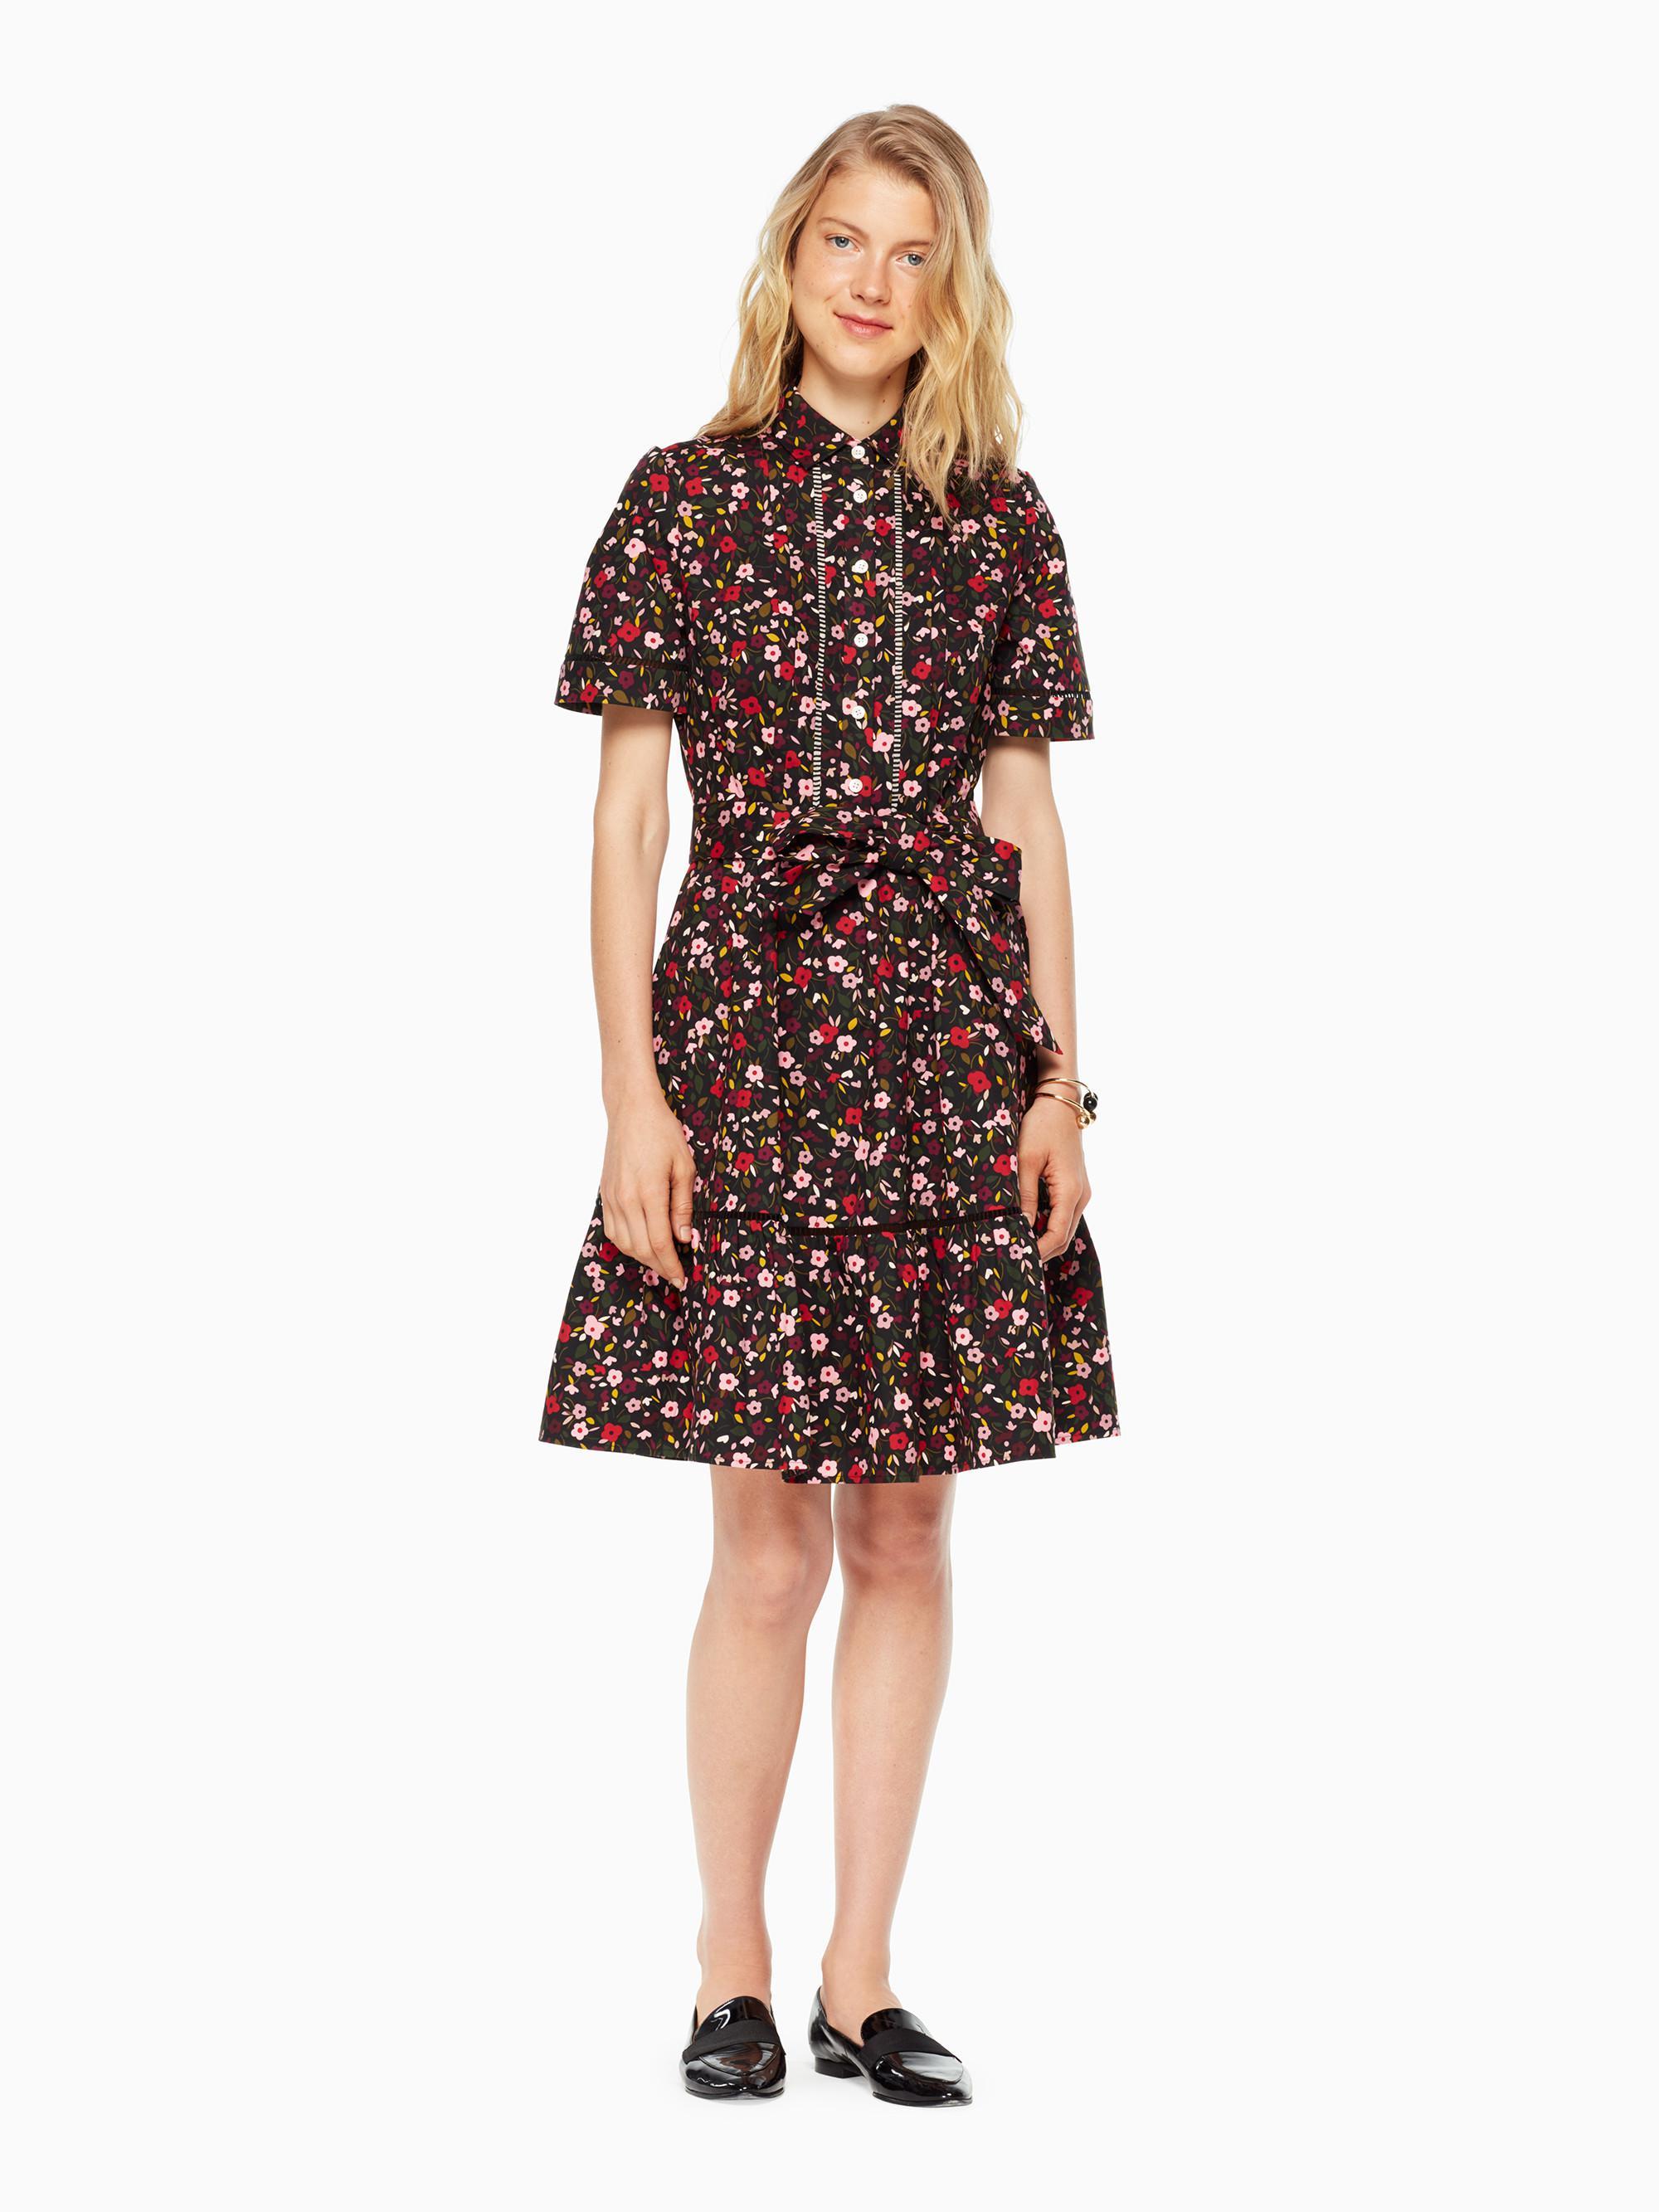 6249b613bac Lyst - Kate Spade Boho Floral Shirtdress in Black